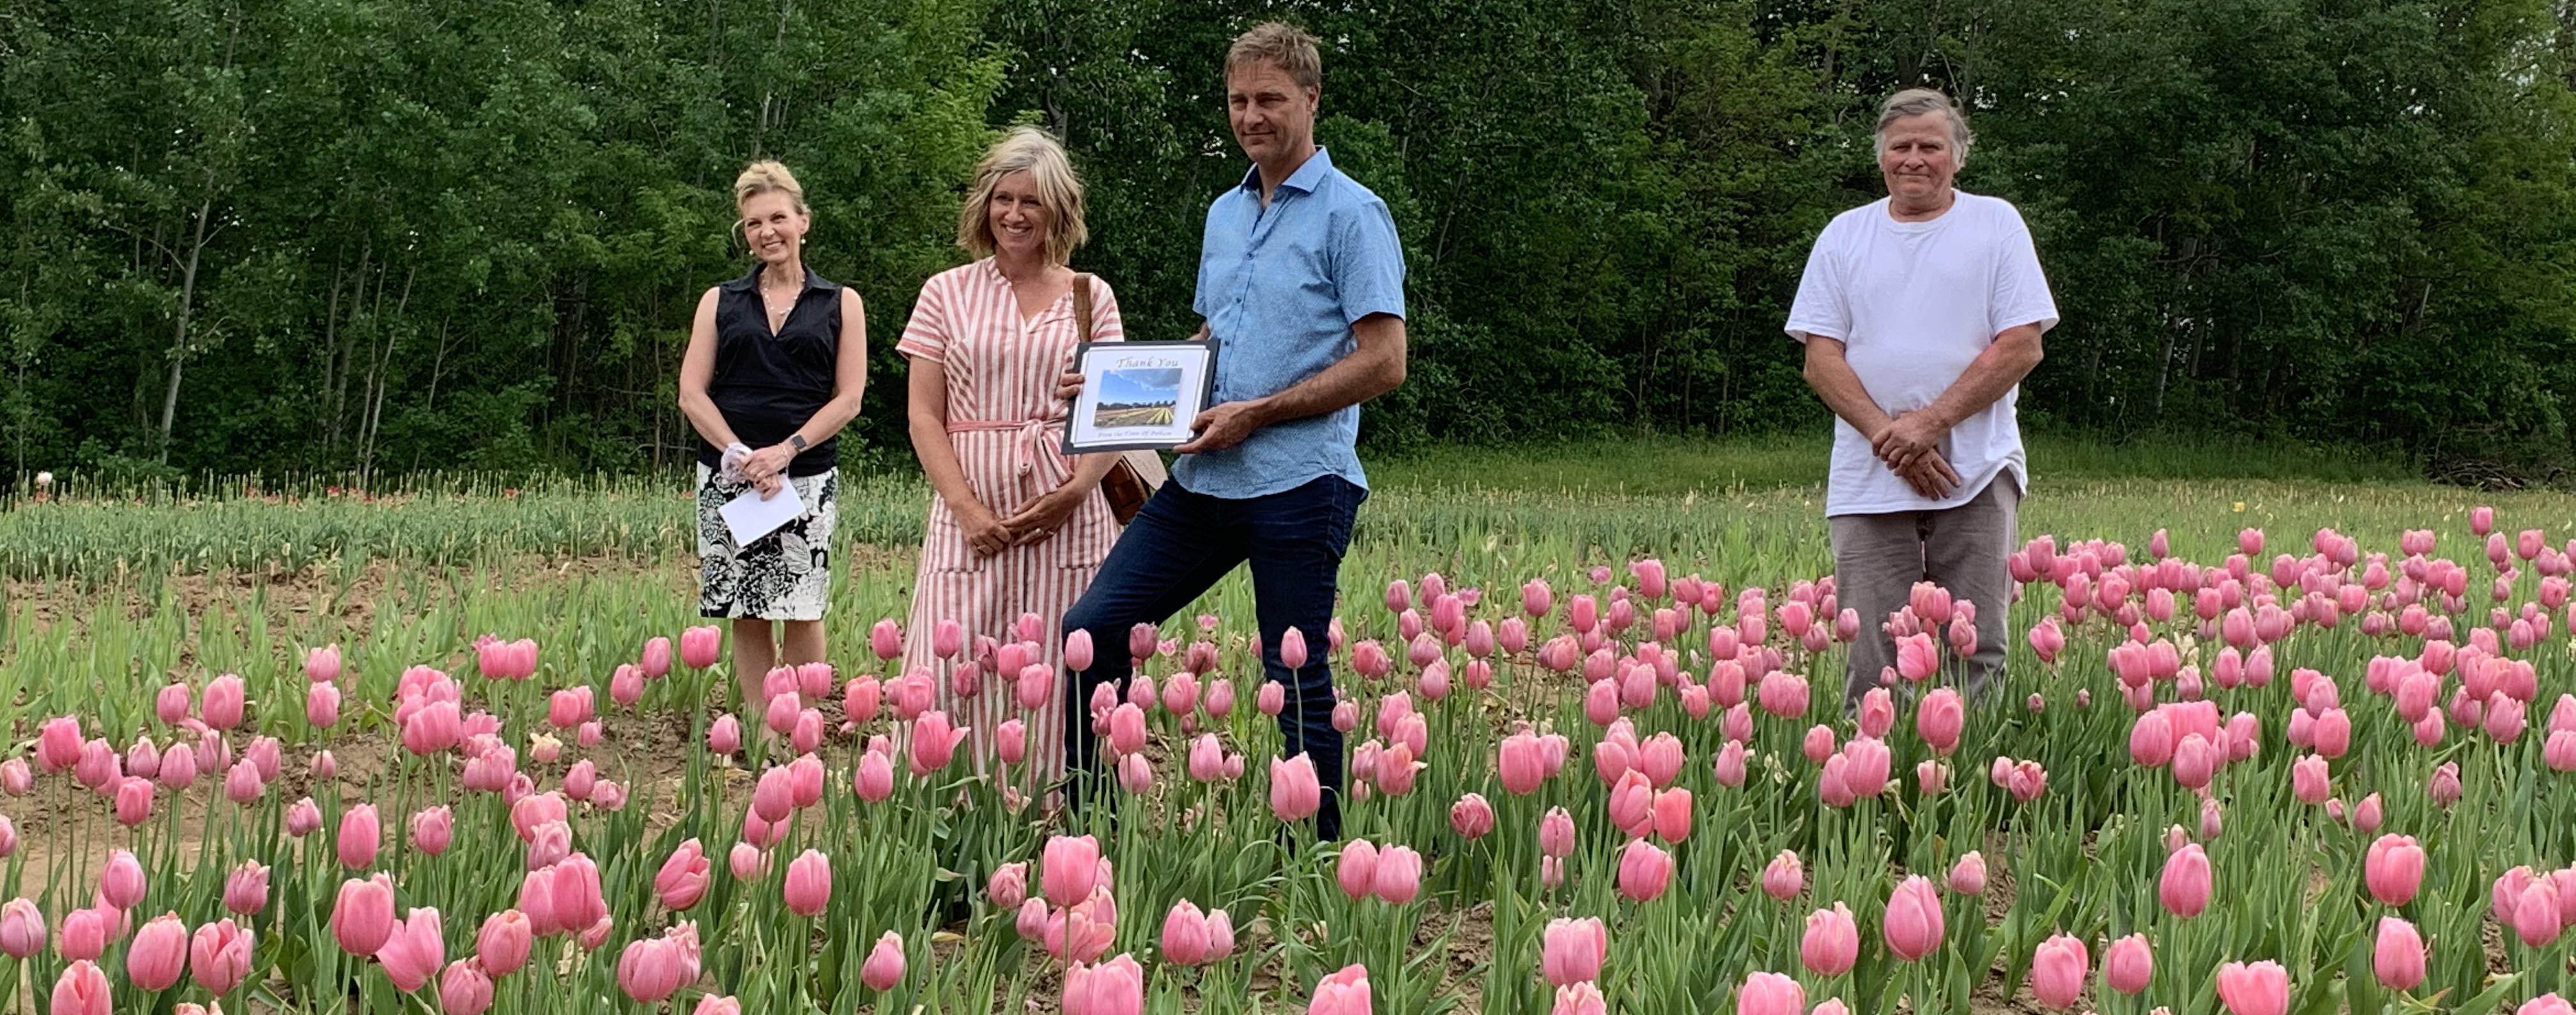 people standing in tulip field